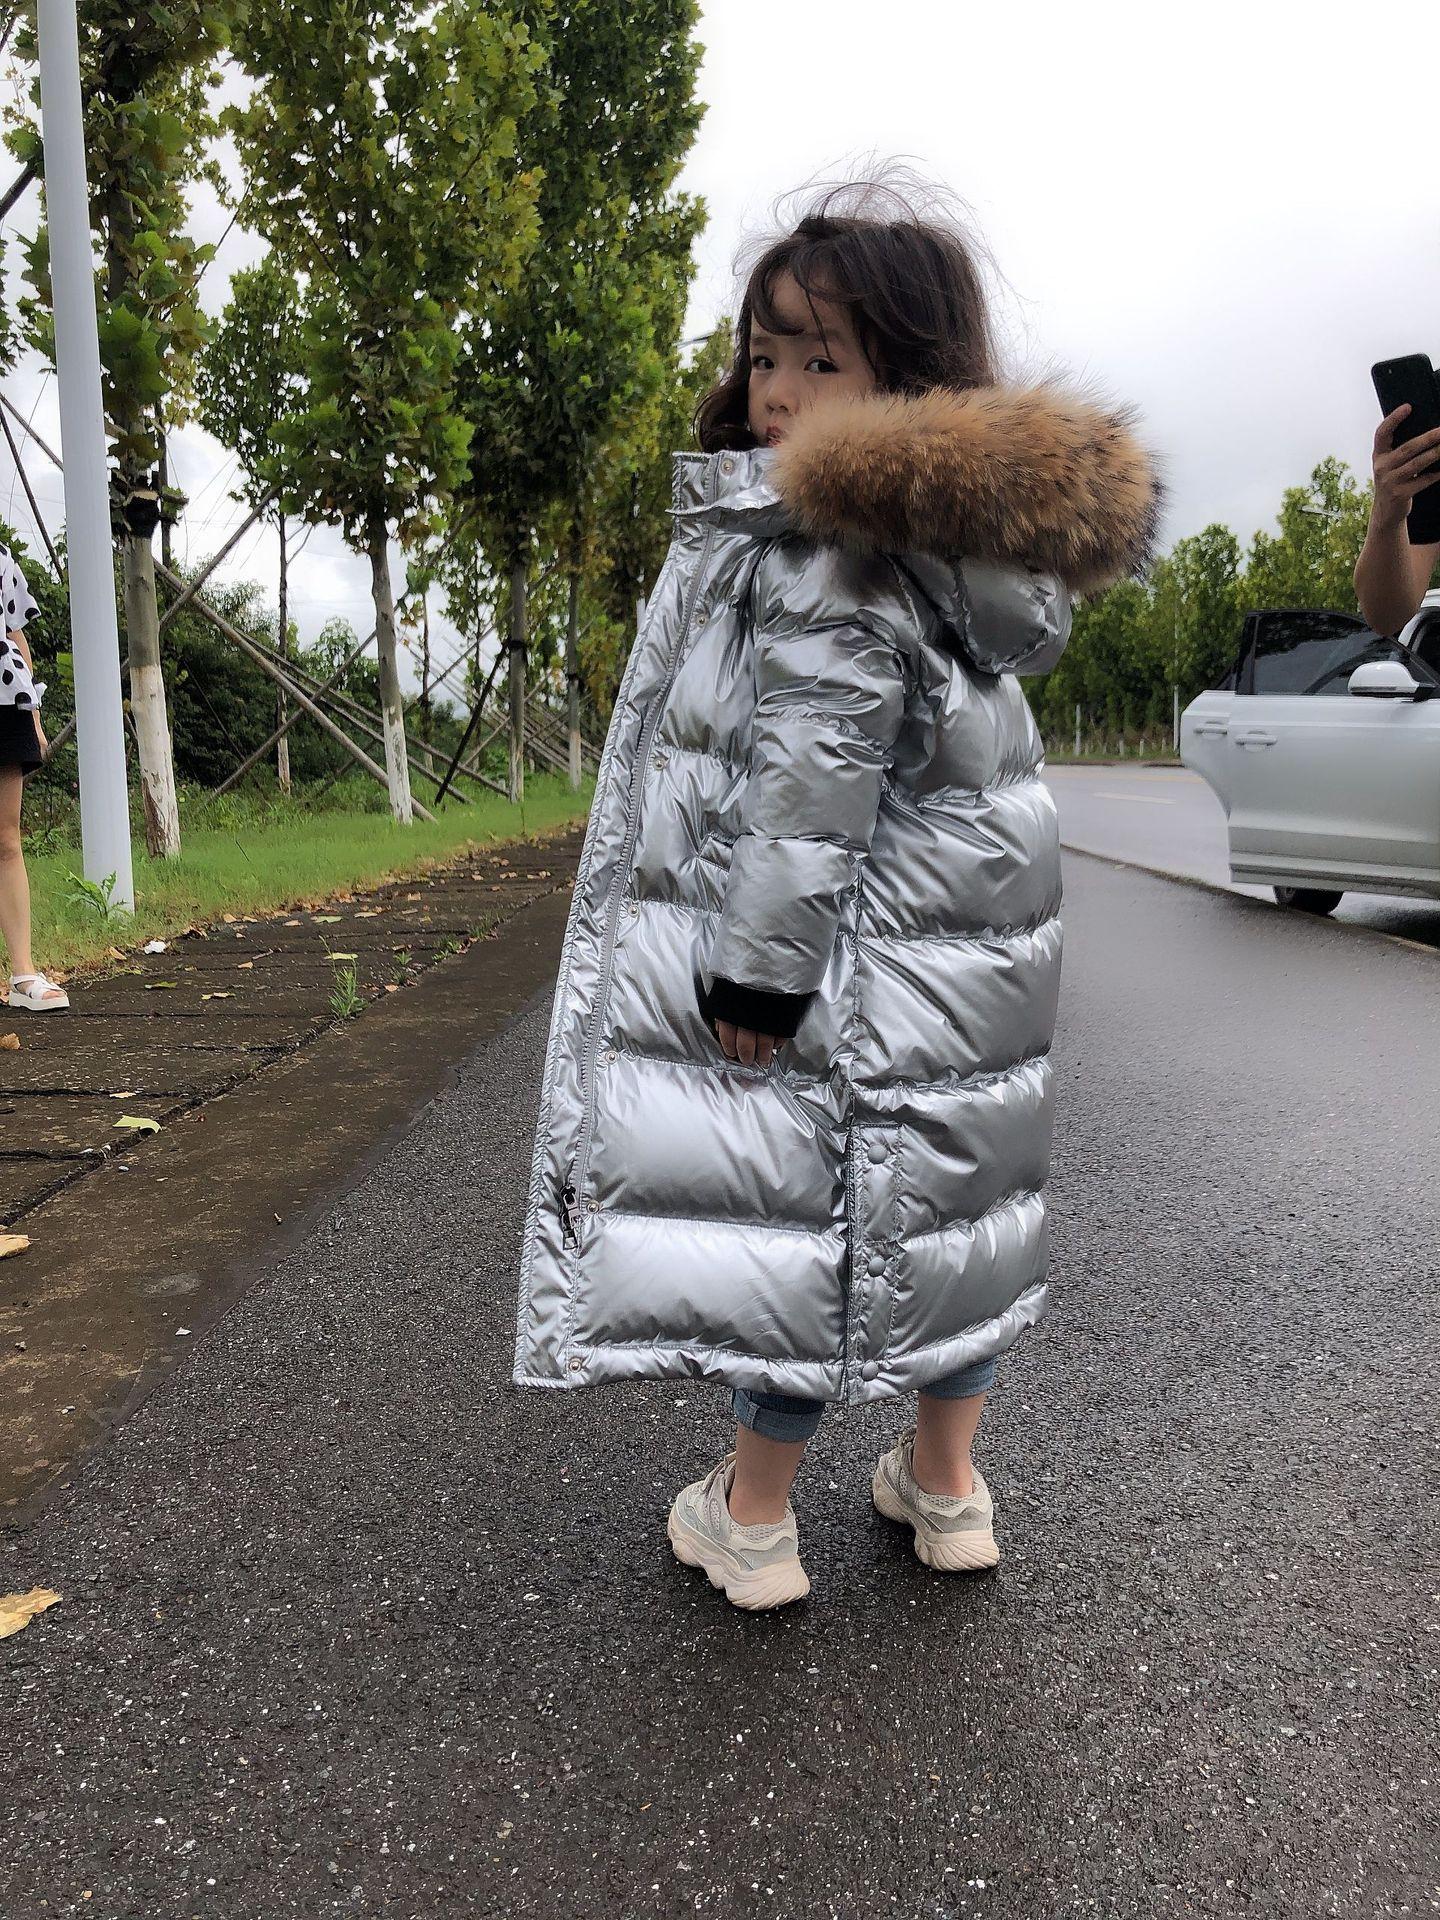 OLEKID 2021 Russian Winter Down Jacket For Girls Waterproof Shiny Warm Girls Winter Coat 5-14 Years Teenage Girl Parka Snowsuit